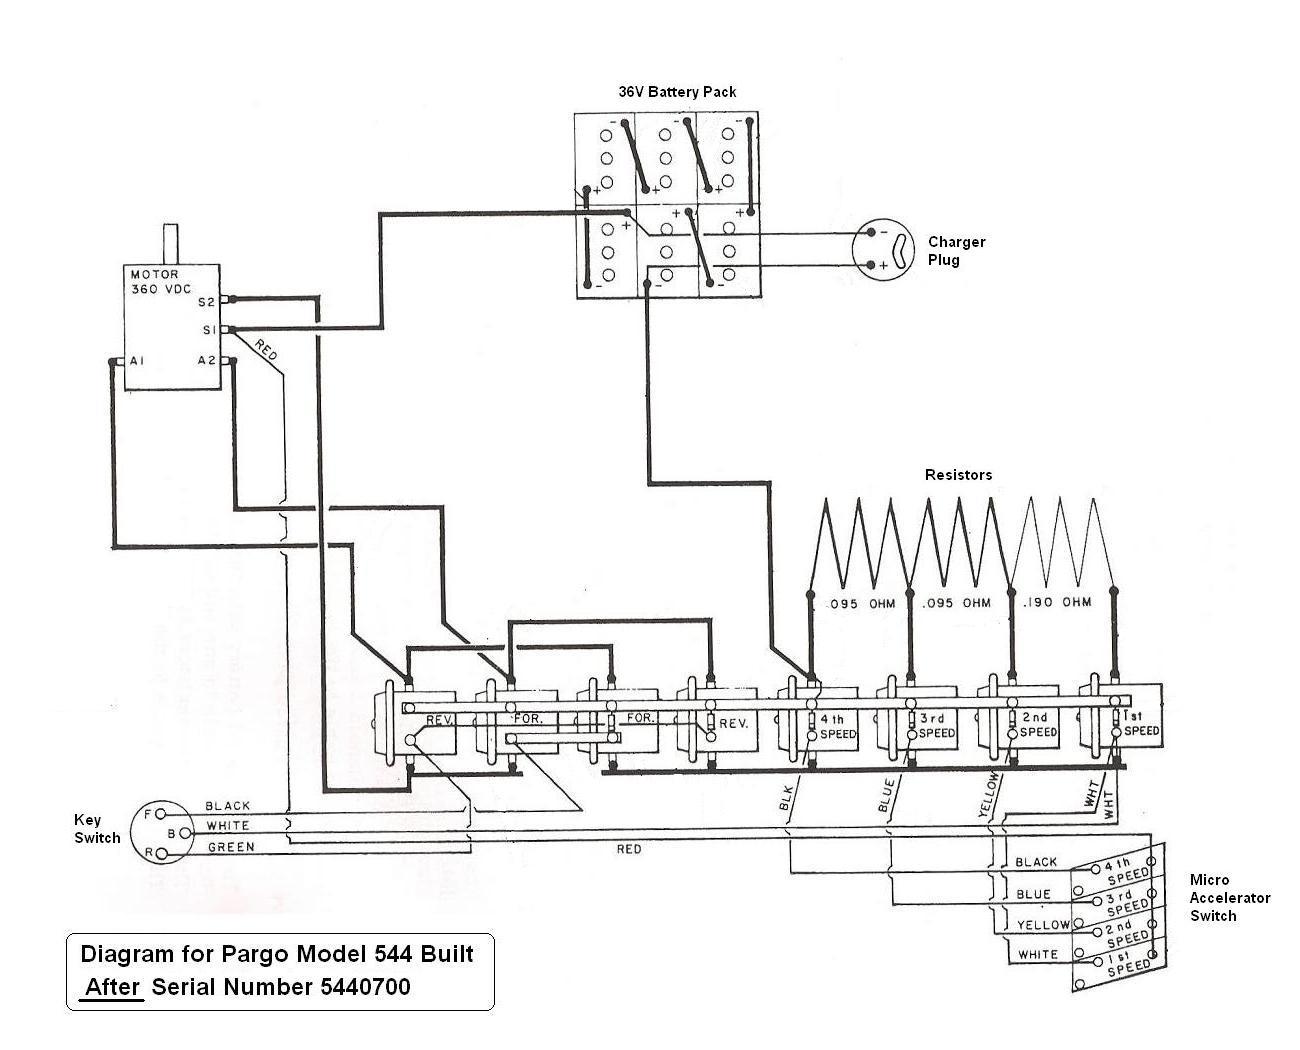 taylor dunn t bird wiring schematic battery best wiring library New Holland Wiring Schematic pargo_after?resize\u003d665%2c537 taylor dunn wiring diagram the best